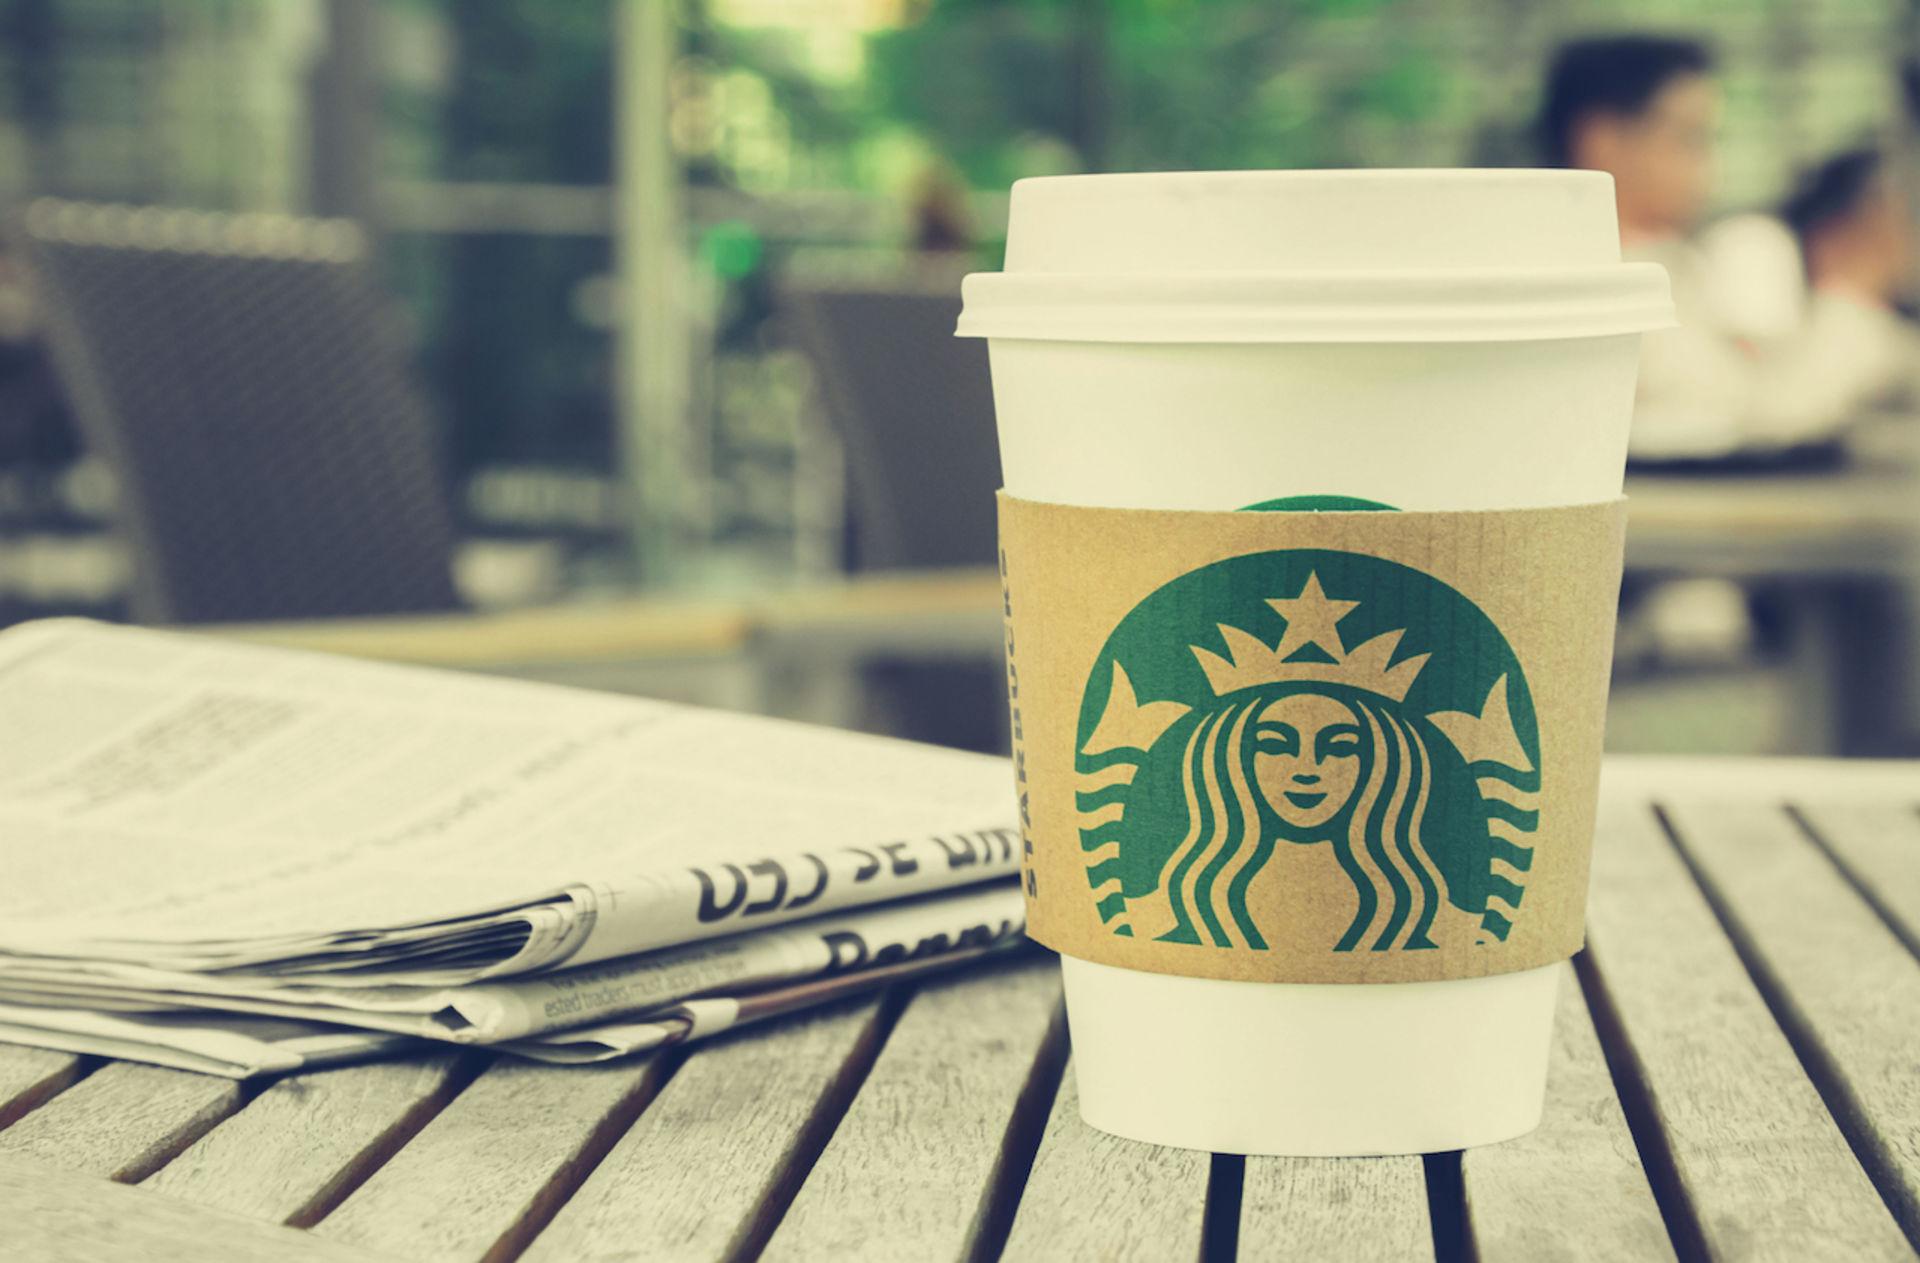 How to Save Big Bucks at Starbucks